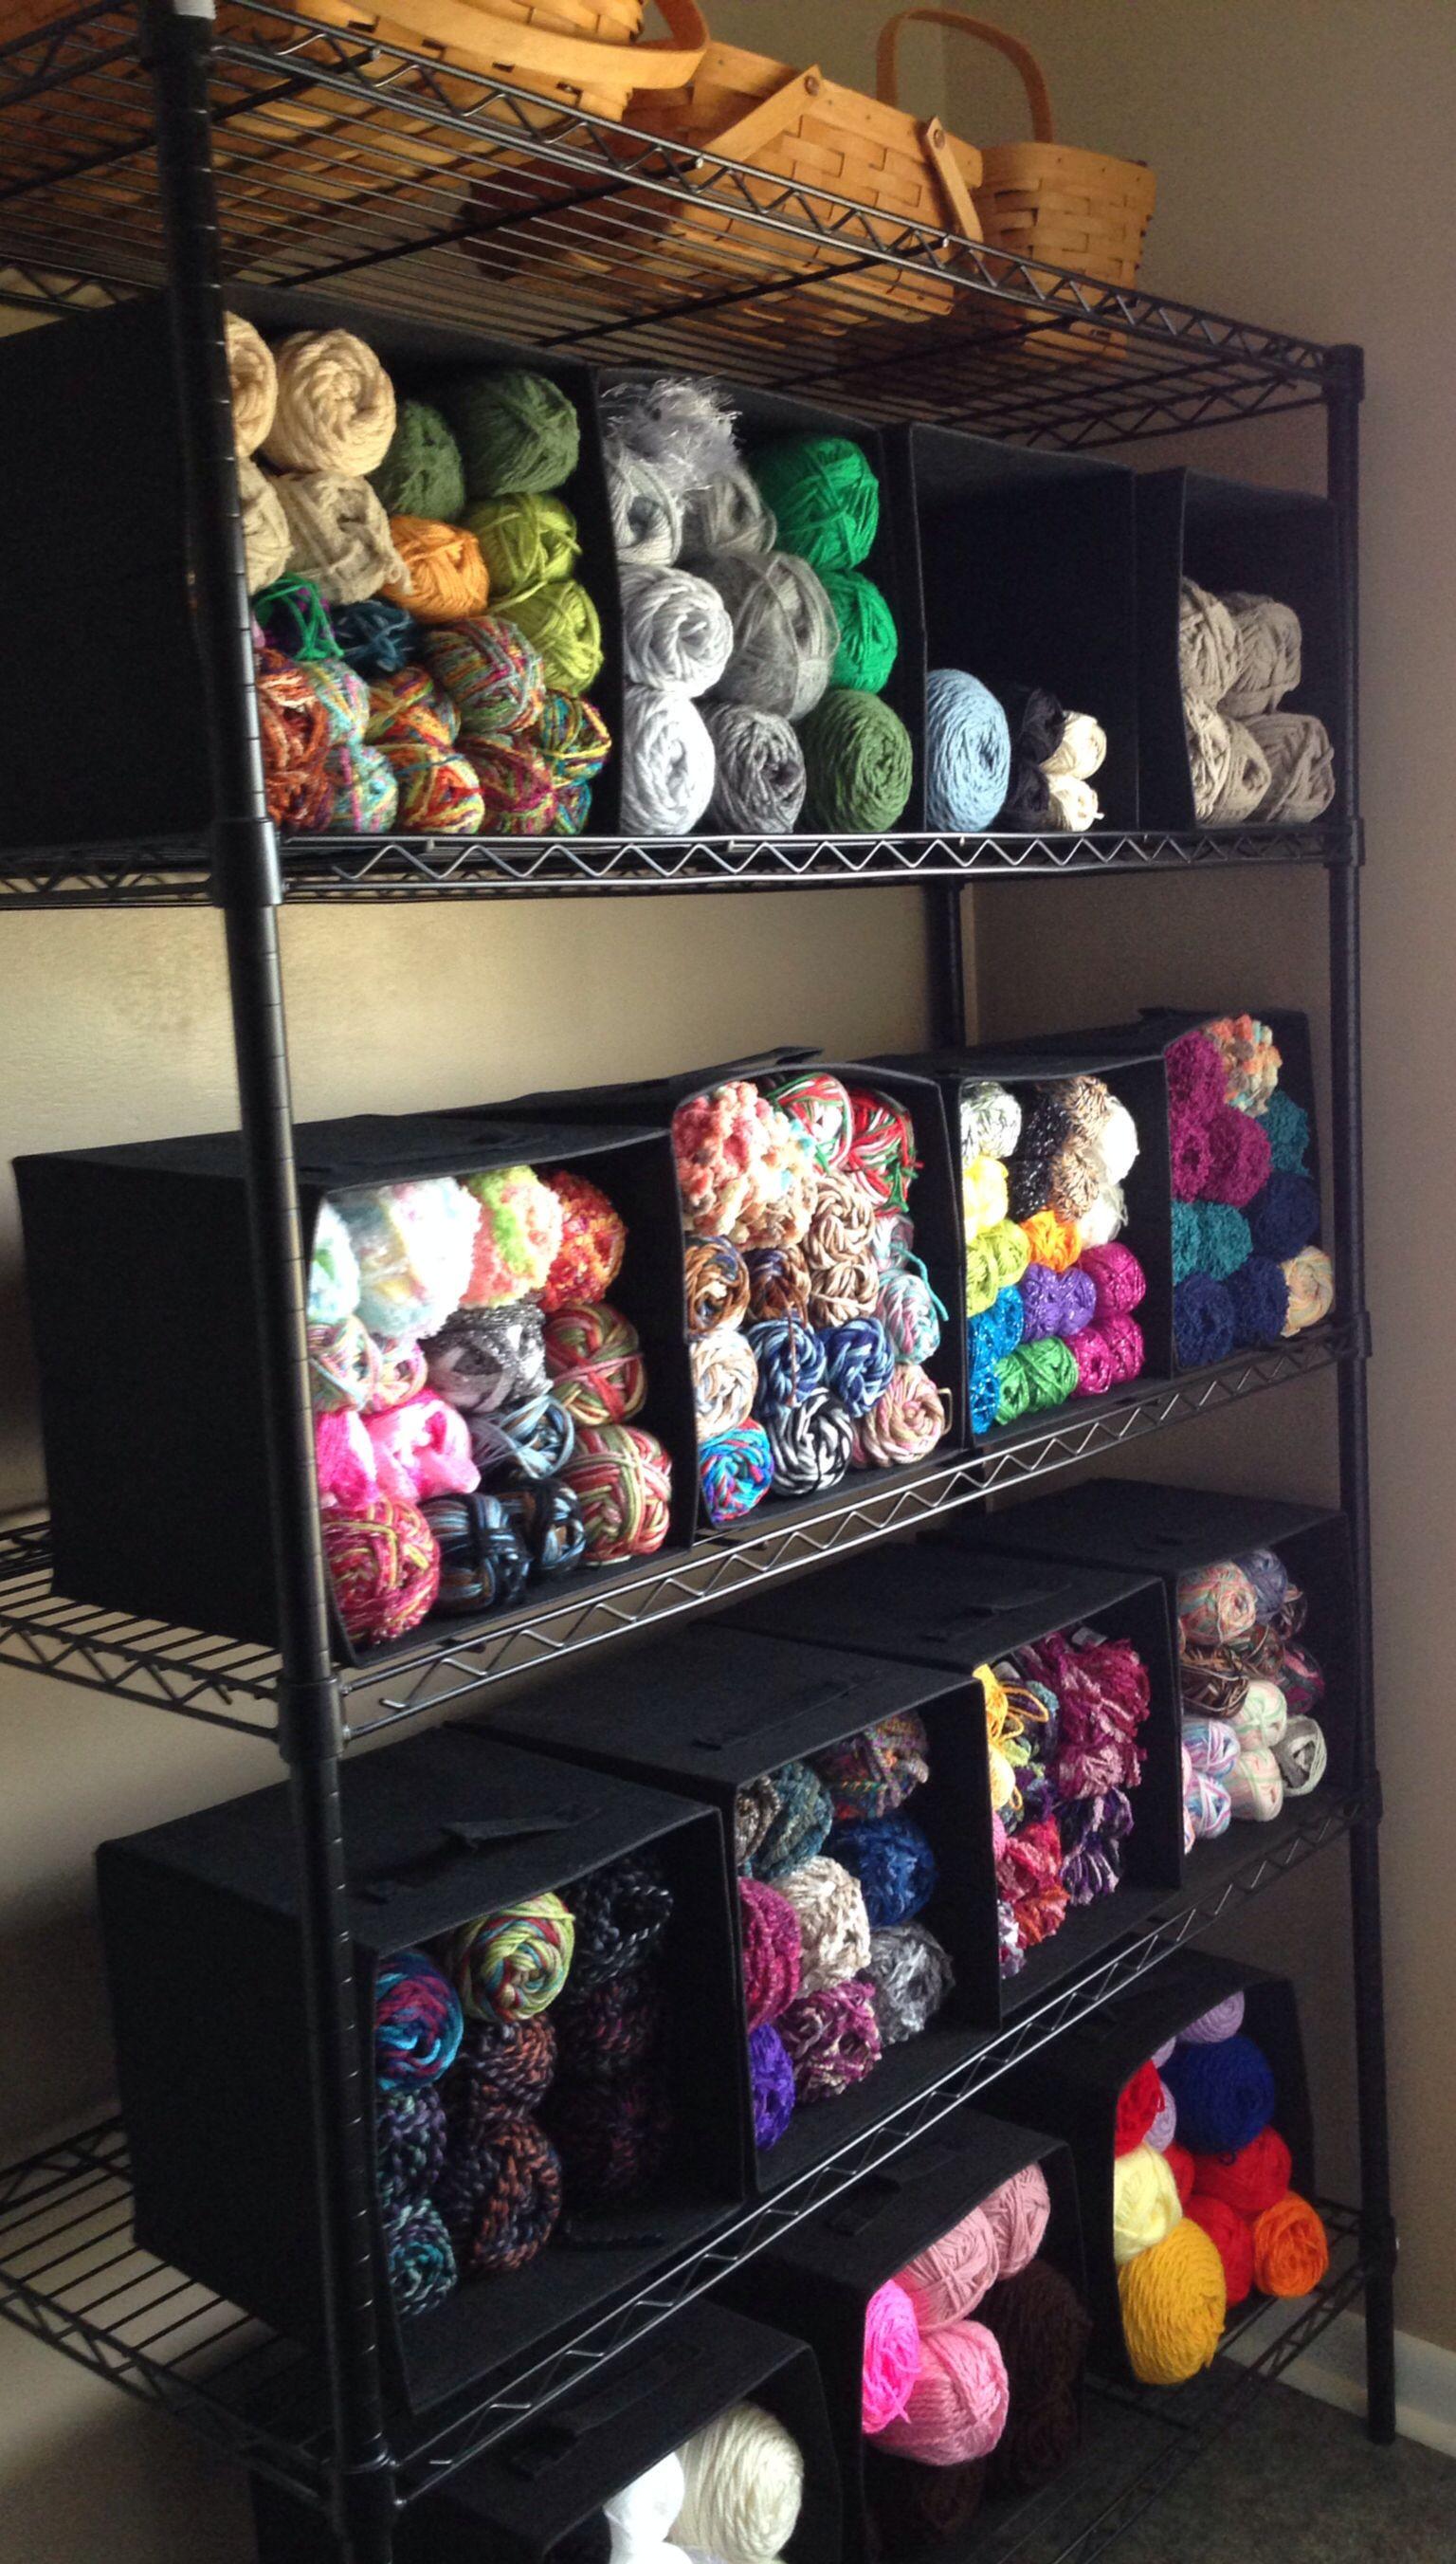 Yarn Craft Room Storage Idea Year Of Clean Water